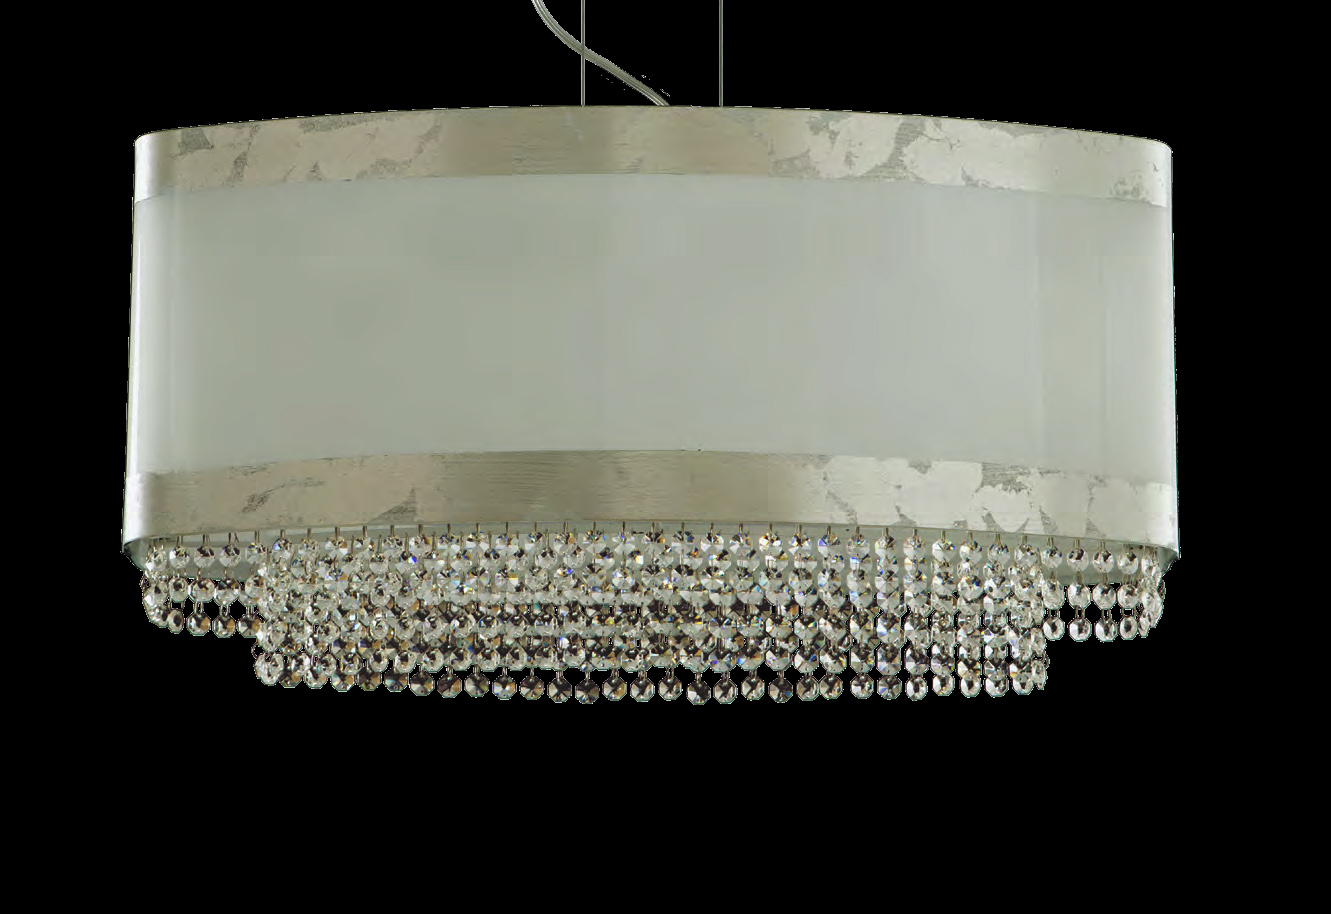 Lampadari Da Bagno Vendita On Line : Padana lampadari lampada a sospensione falena kriss colore